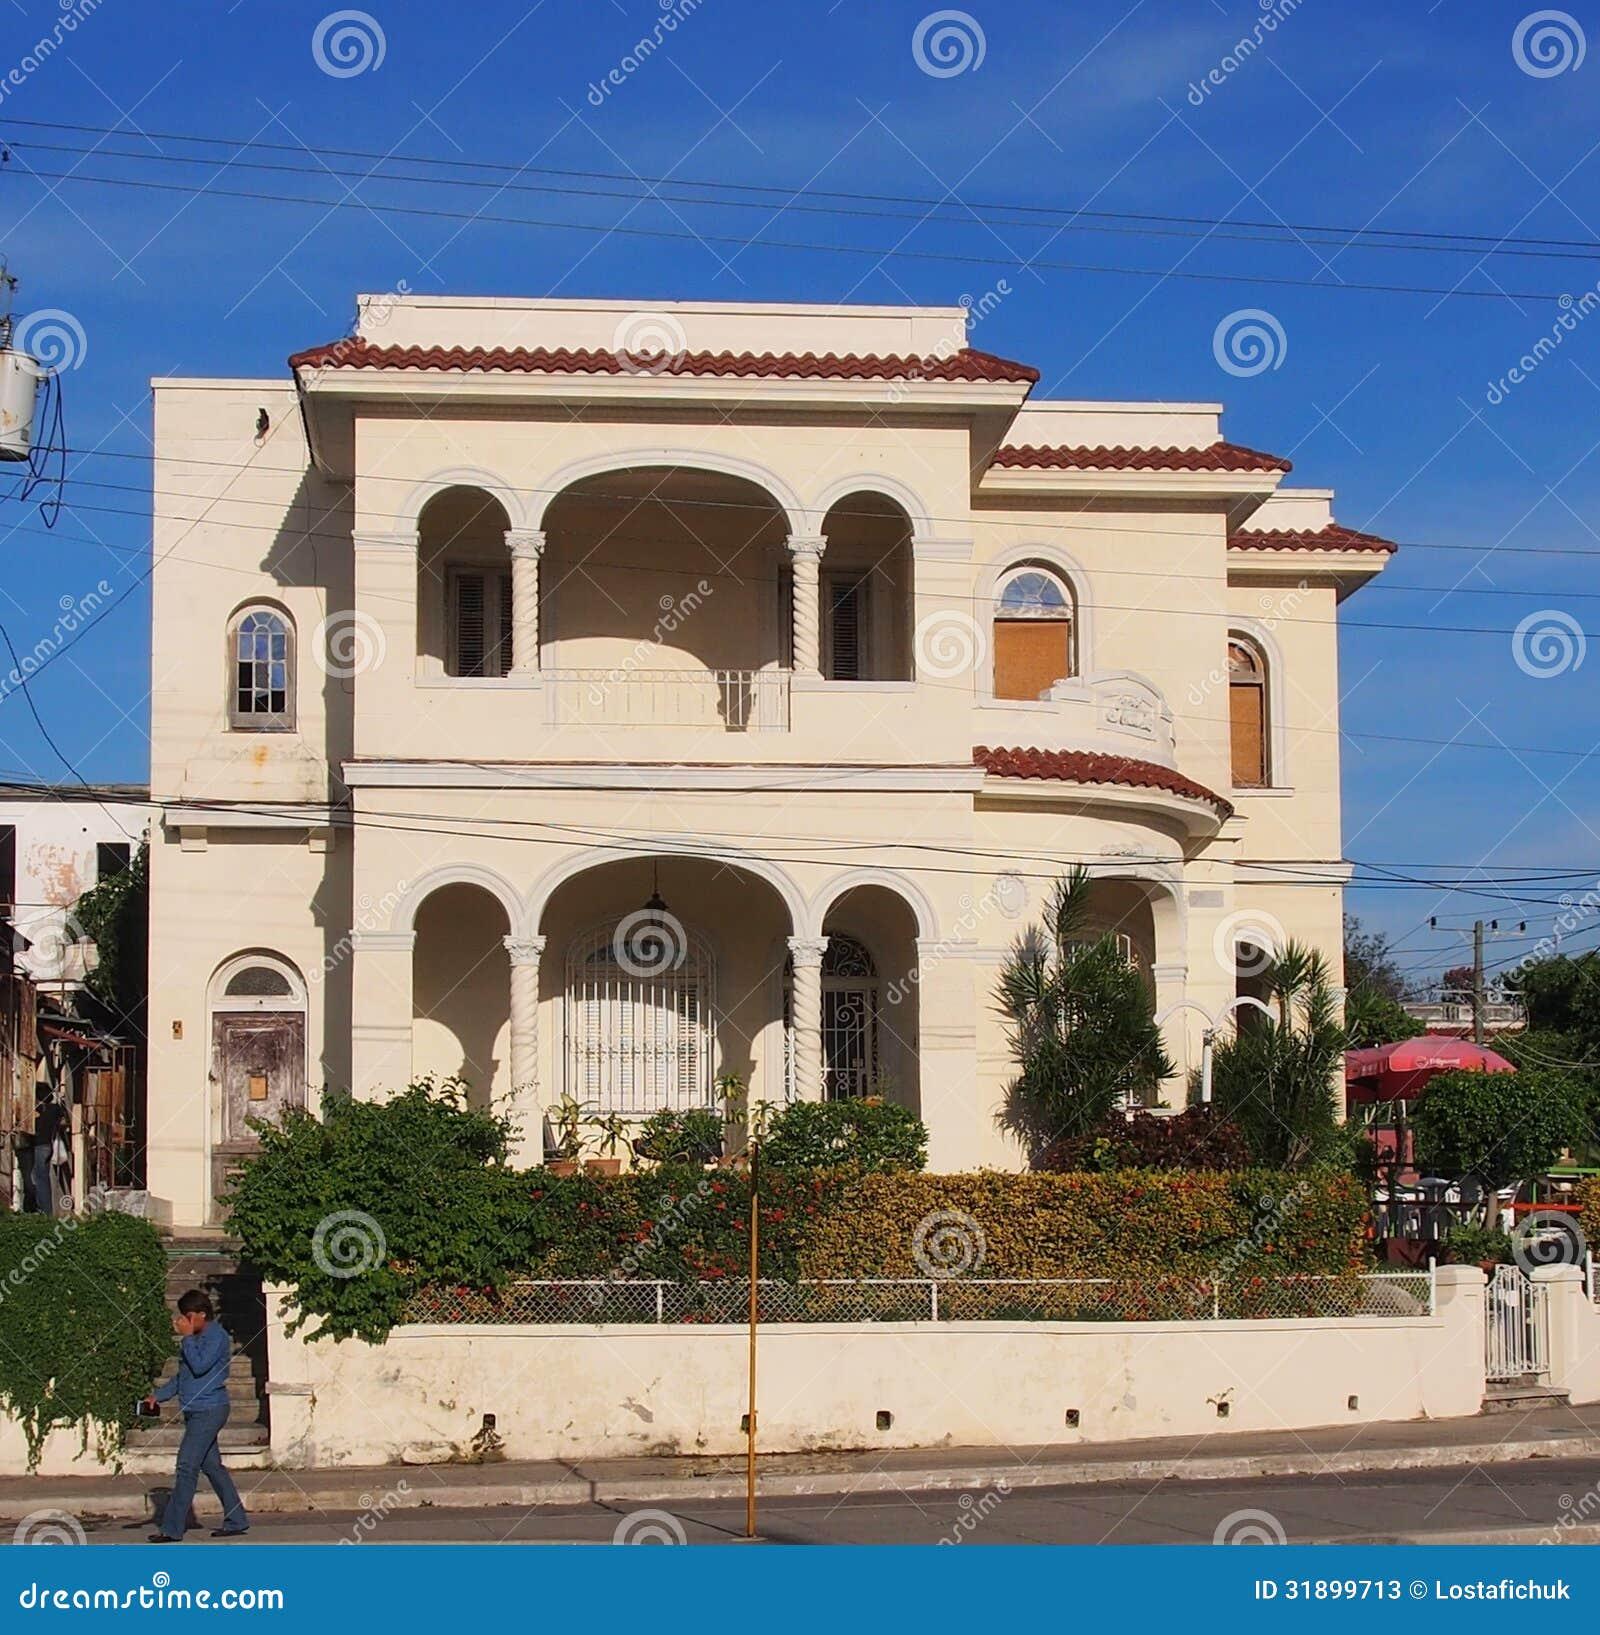 Casa con arquitectura espa ola en havana cuba foto de for Arquitectura espanola